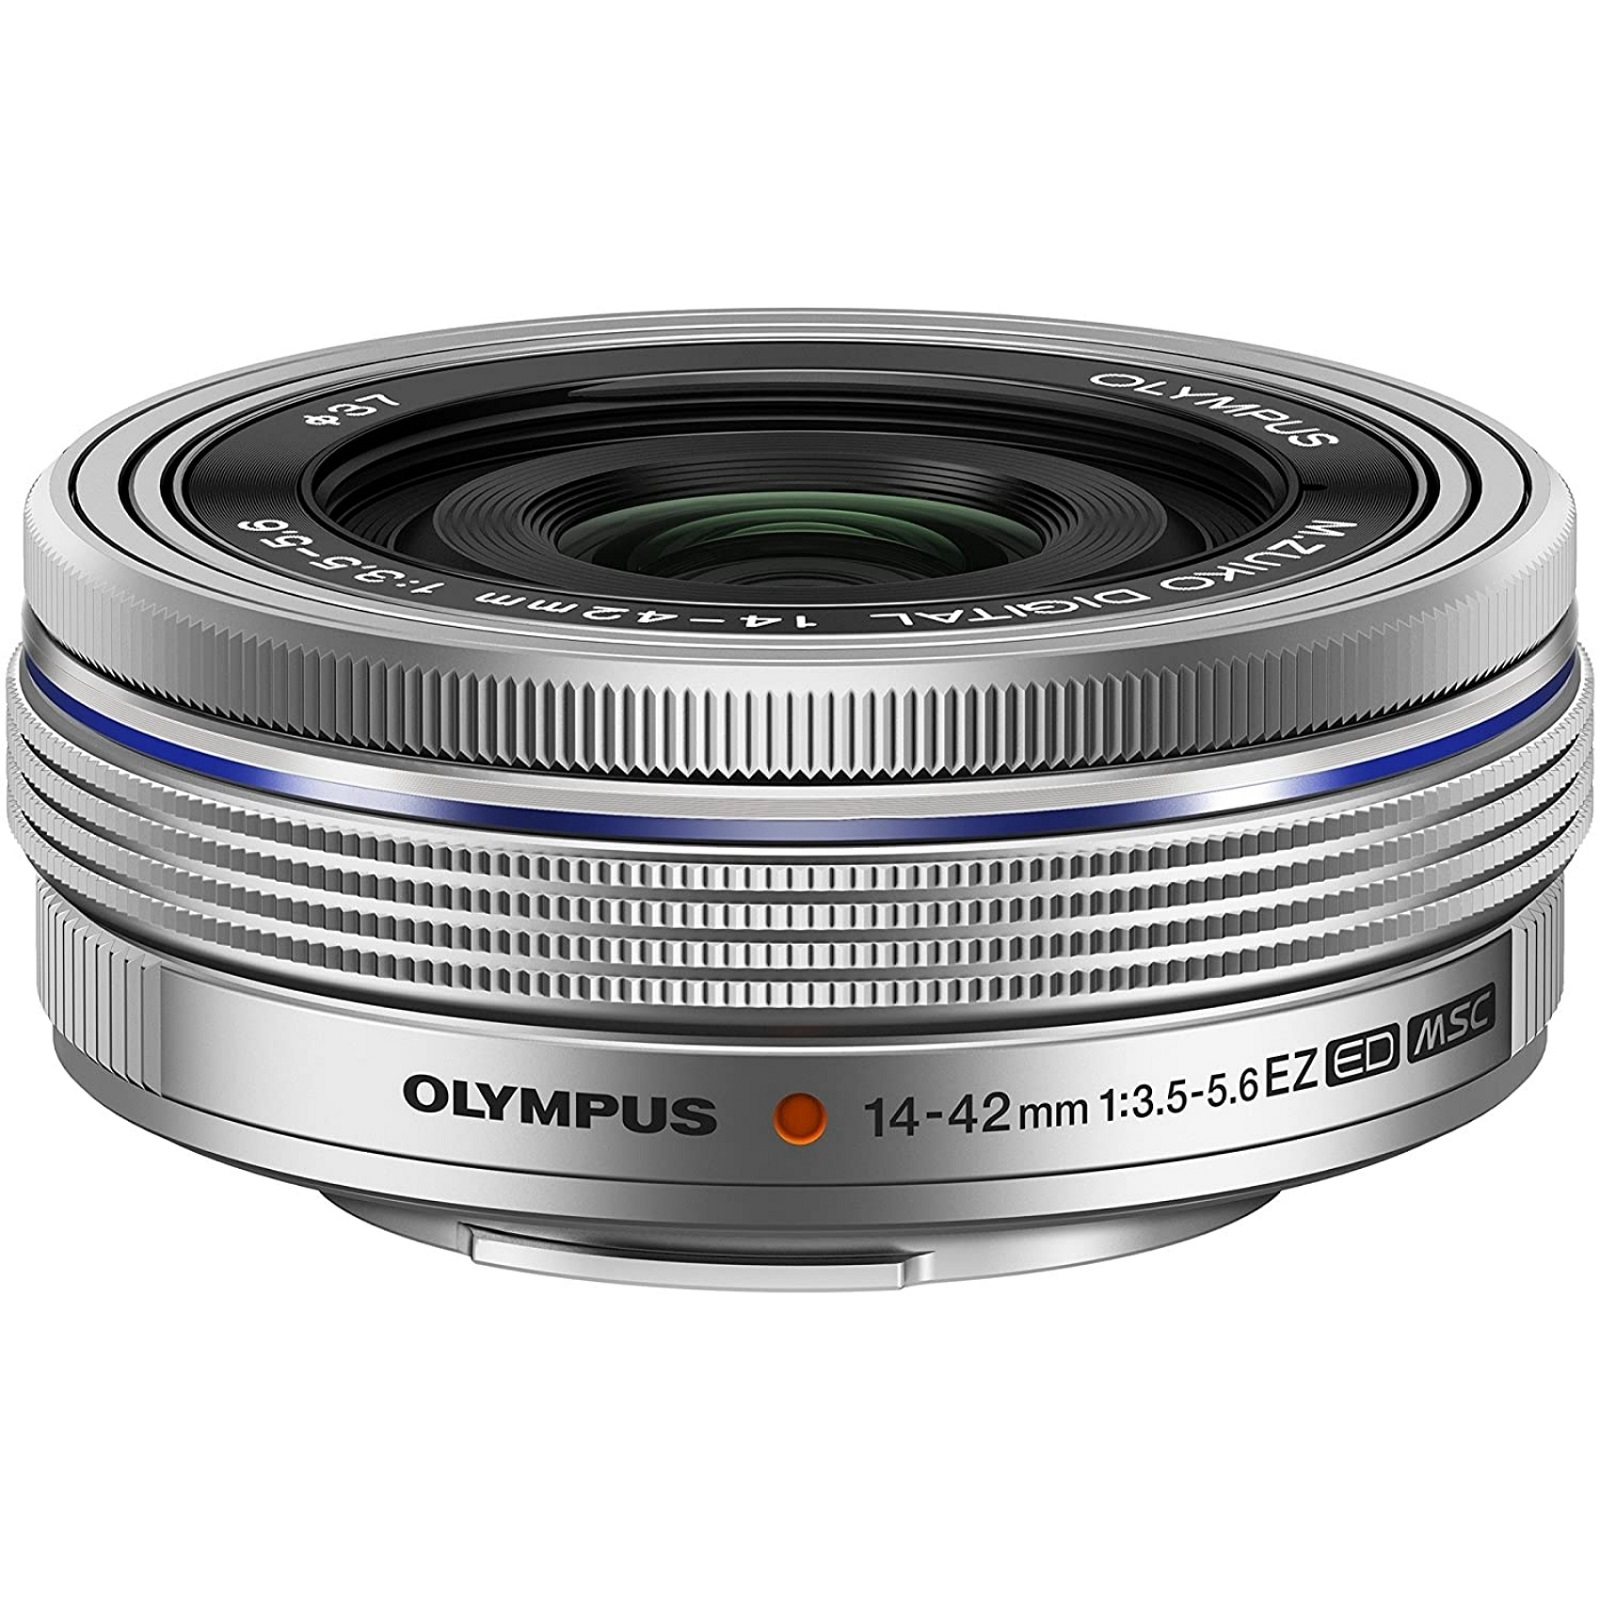 OLYMPUS オリンパス 電動式パンケーキズームレンズ M.ZUIKO DIGITAL ED 14-42mm F3.5-5.6 EZ シルバー 新品 (簡易箱)